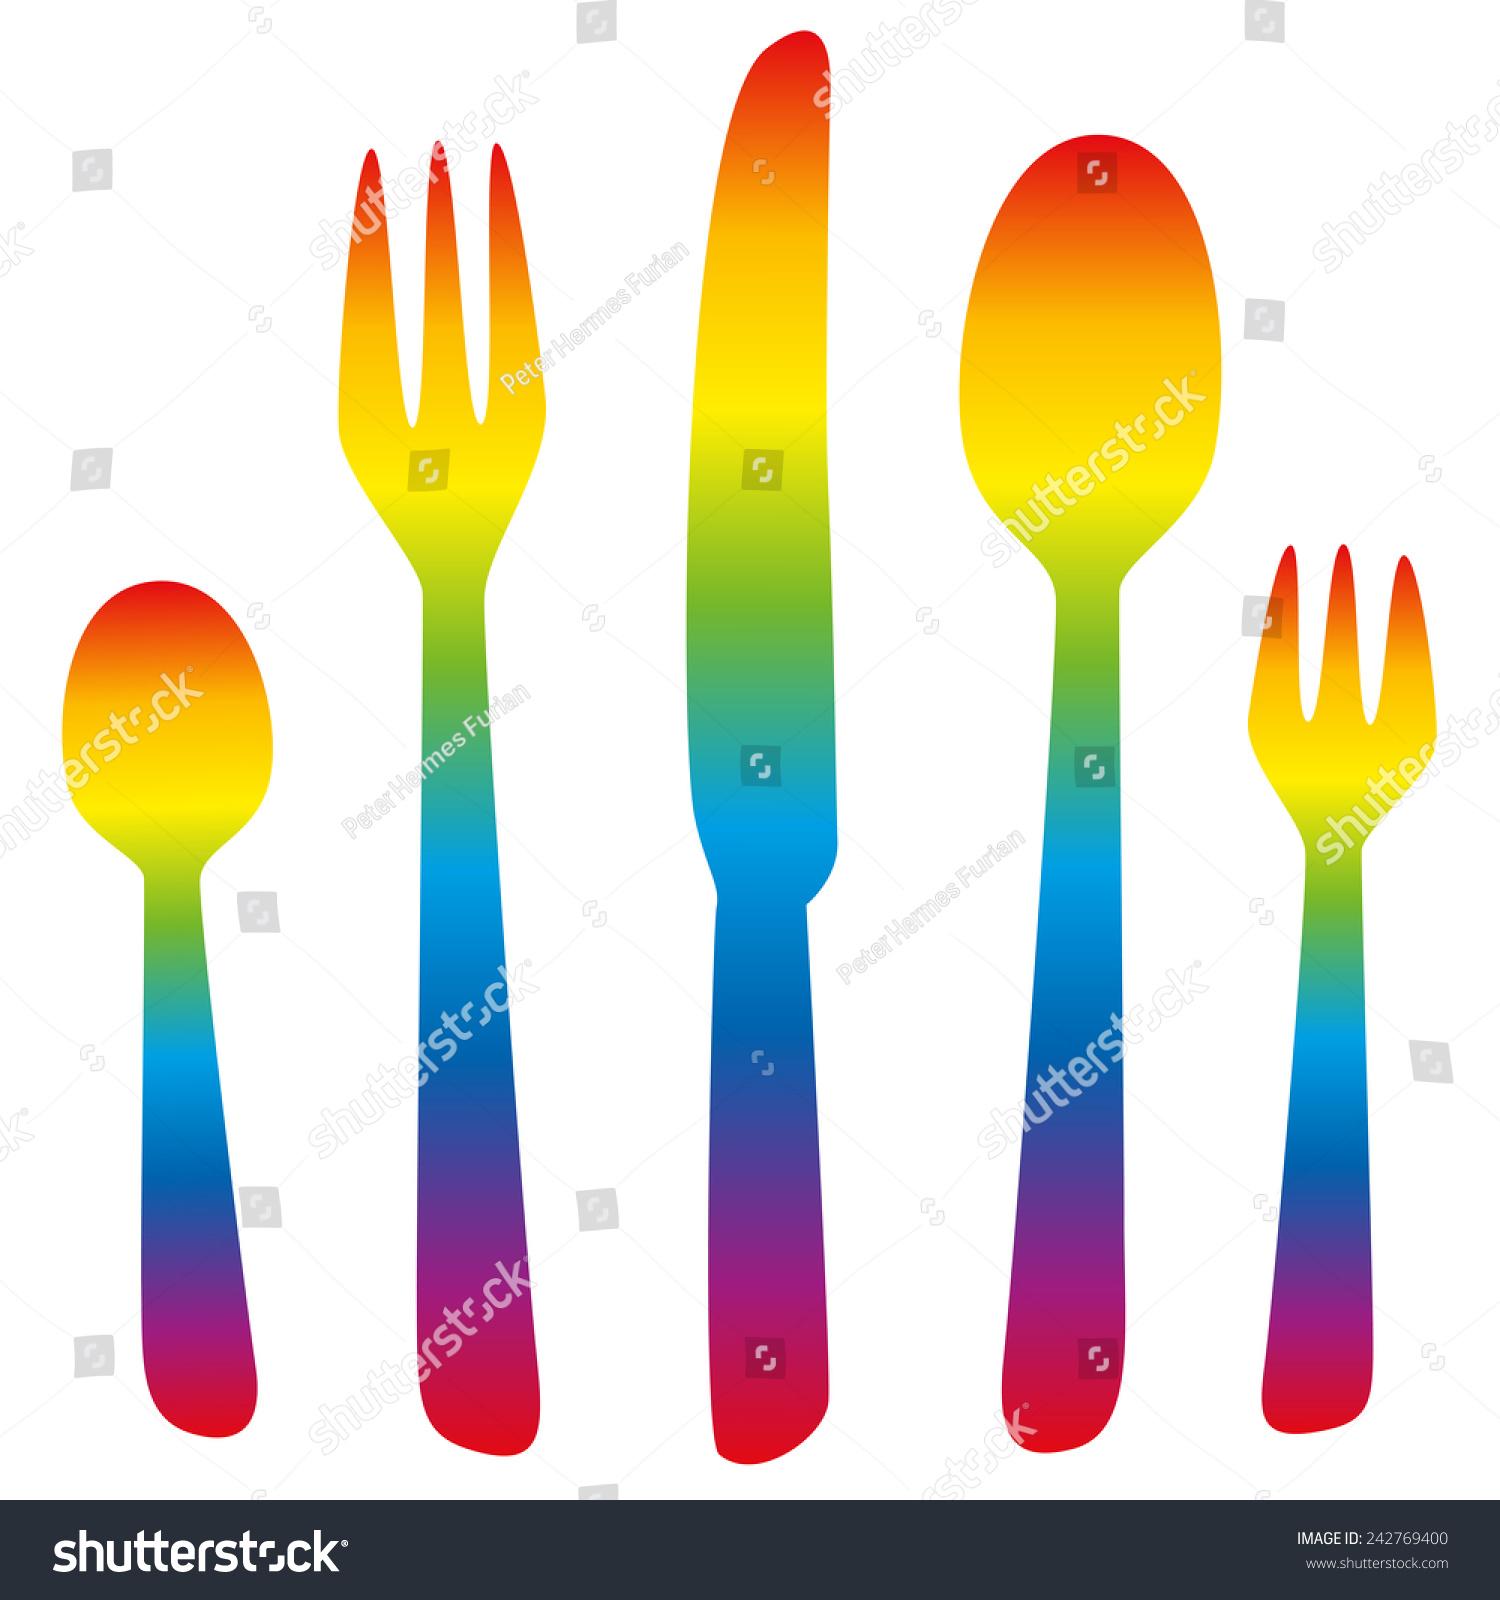 Cutlery Teaspoon Fork Knife Spoon Dessert Stock Vector 242769400 ...